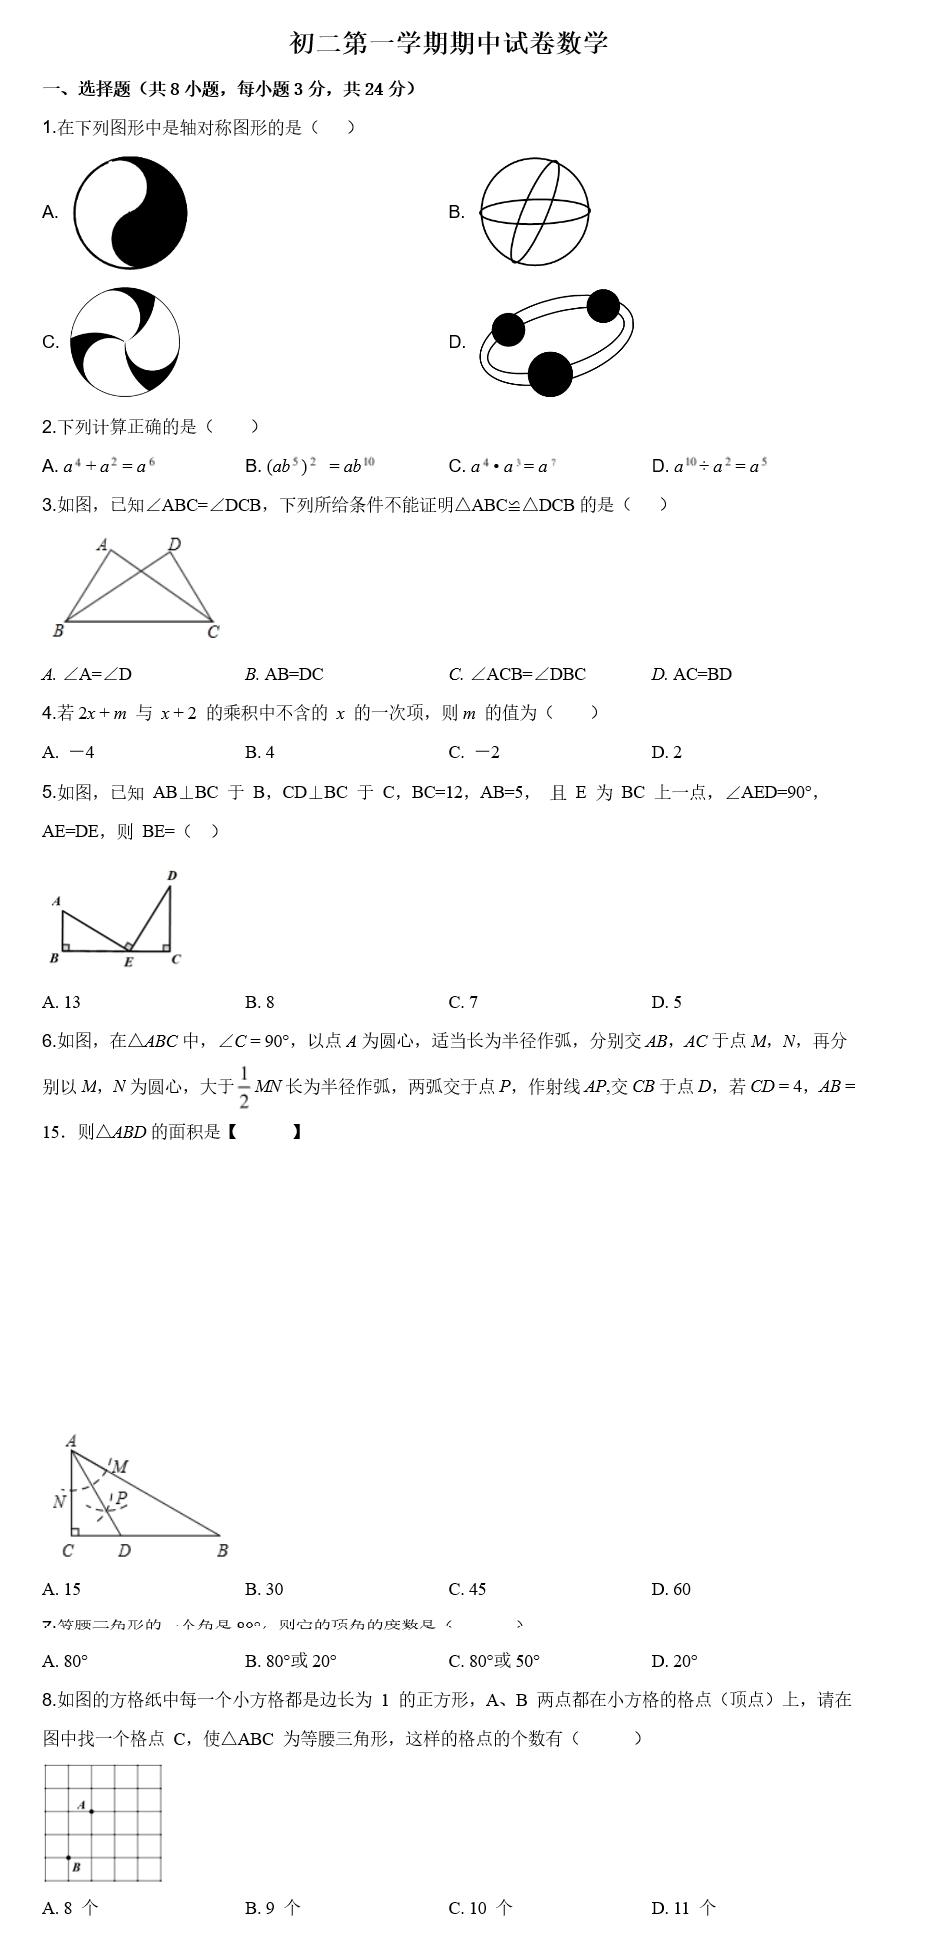 清华大学附属中学.png